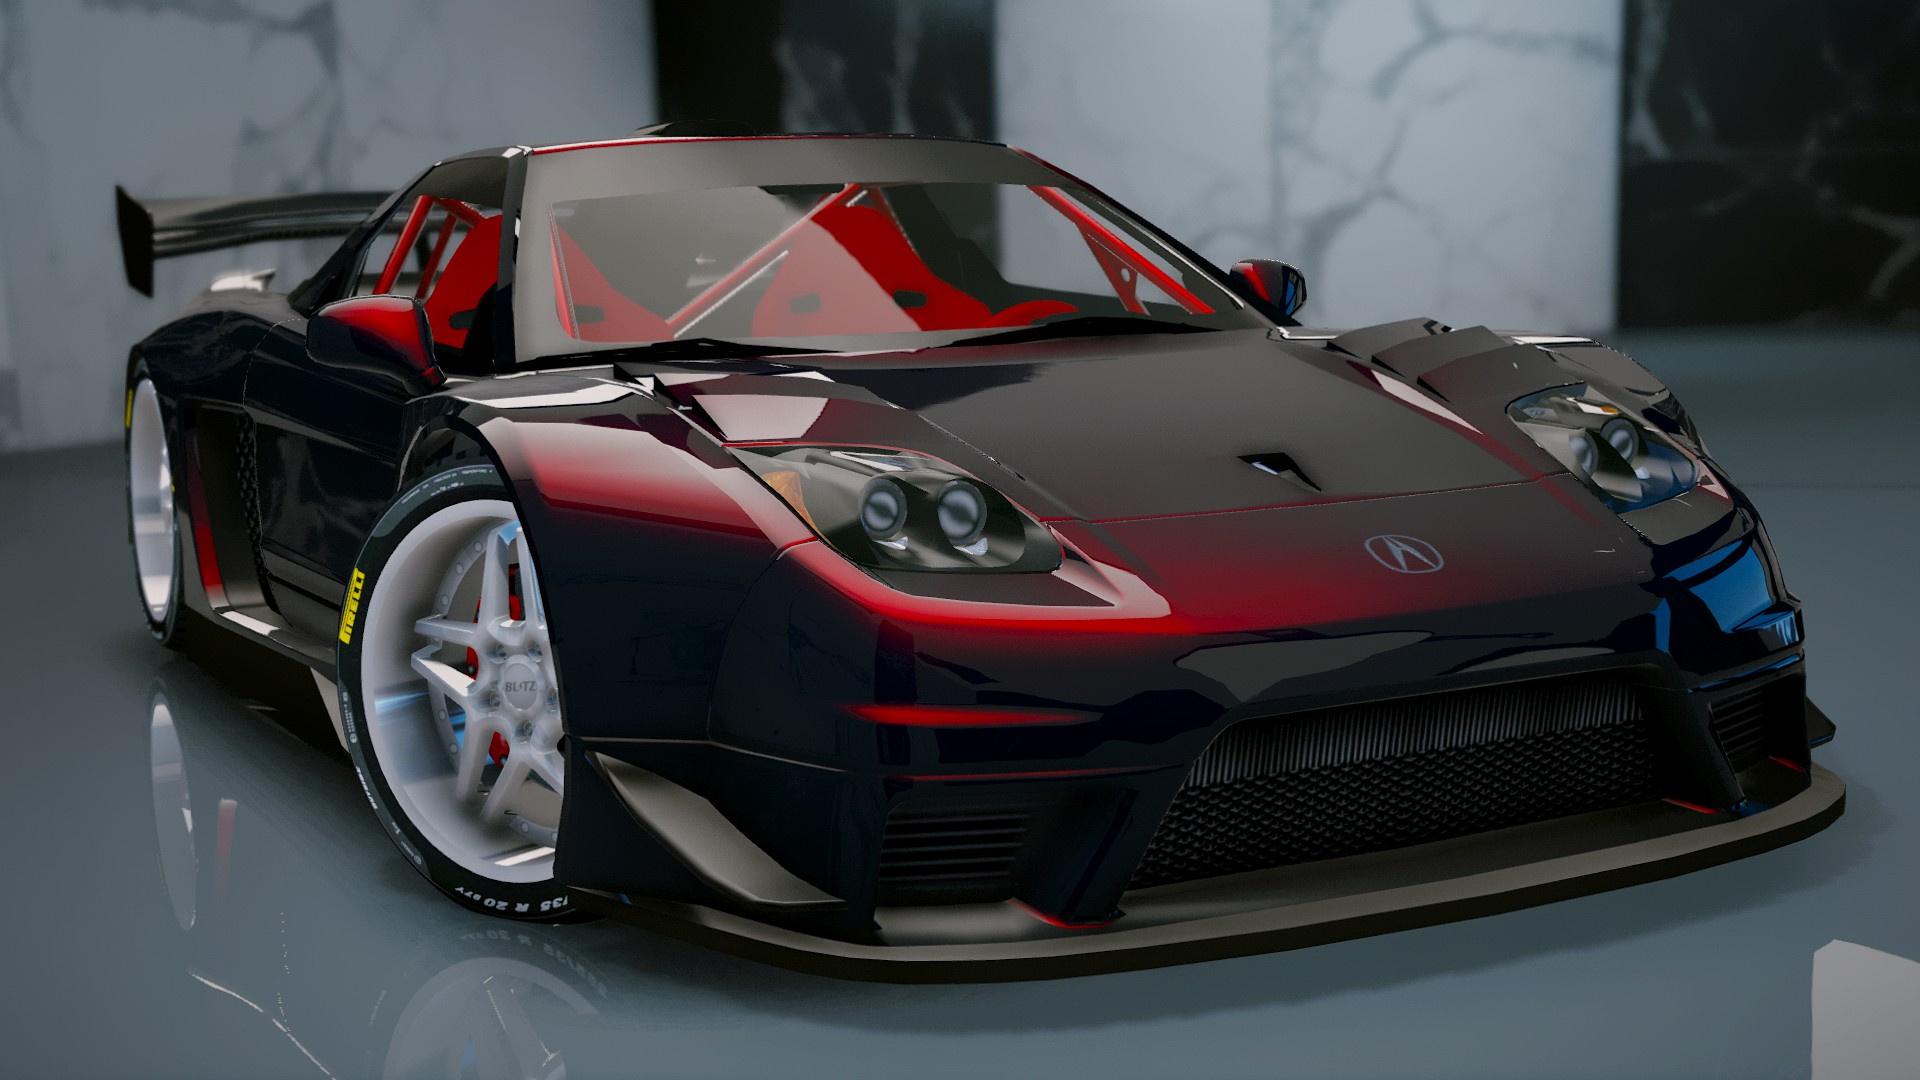 Acura NSX 2002 [Add ] GTA5 Mods